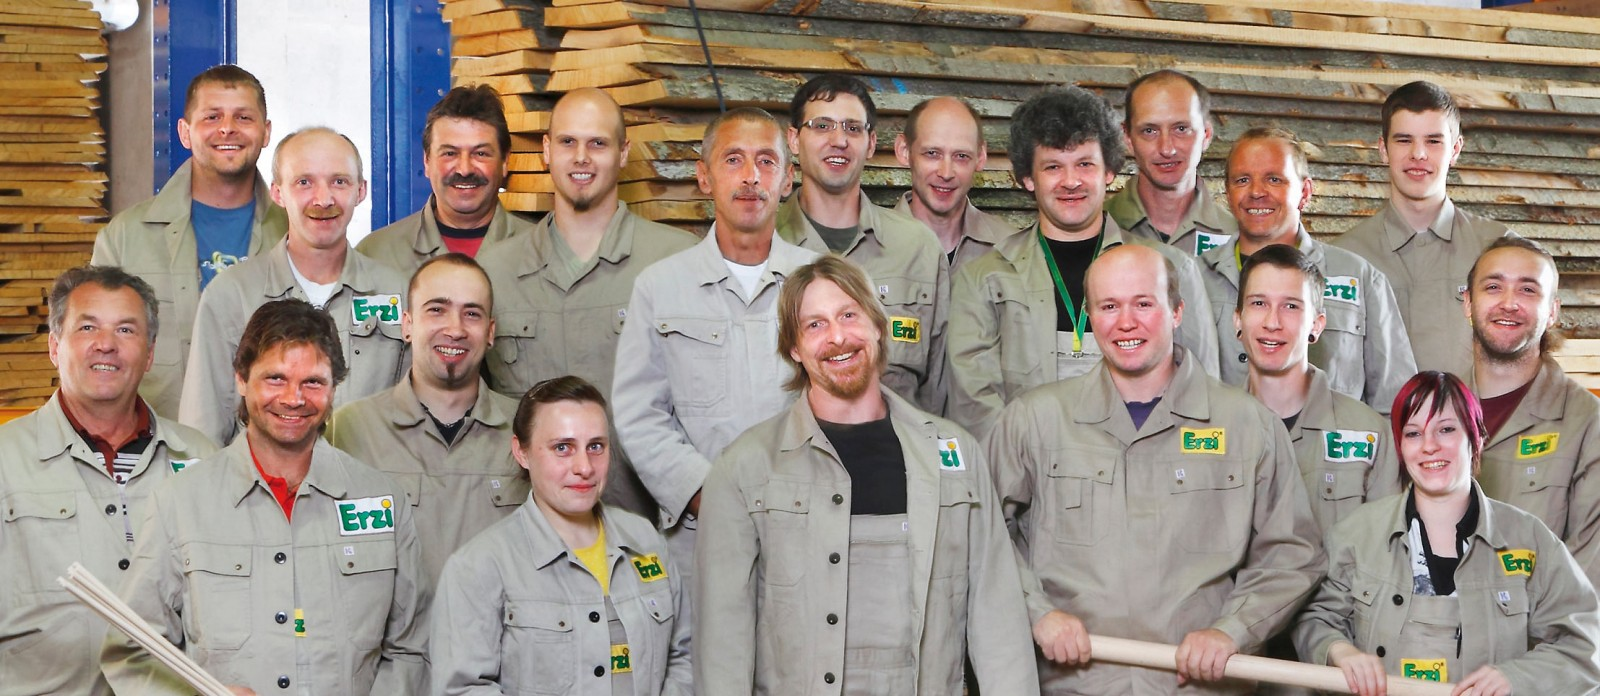 team-Together we are Erzi